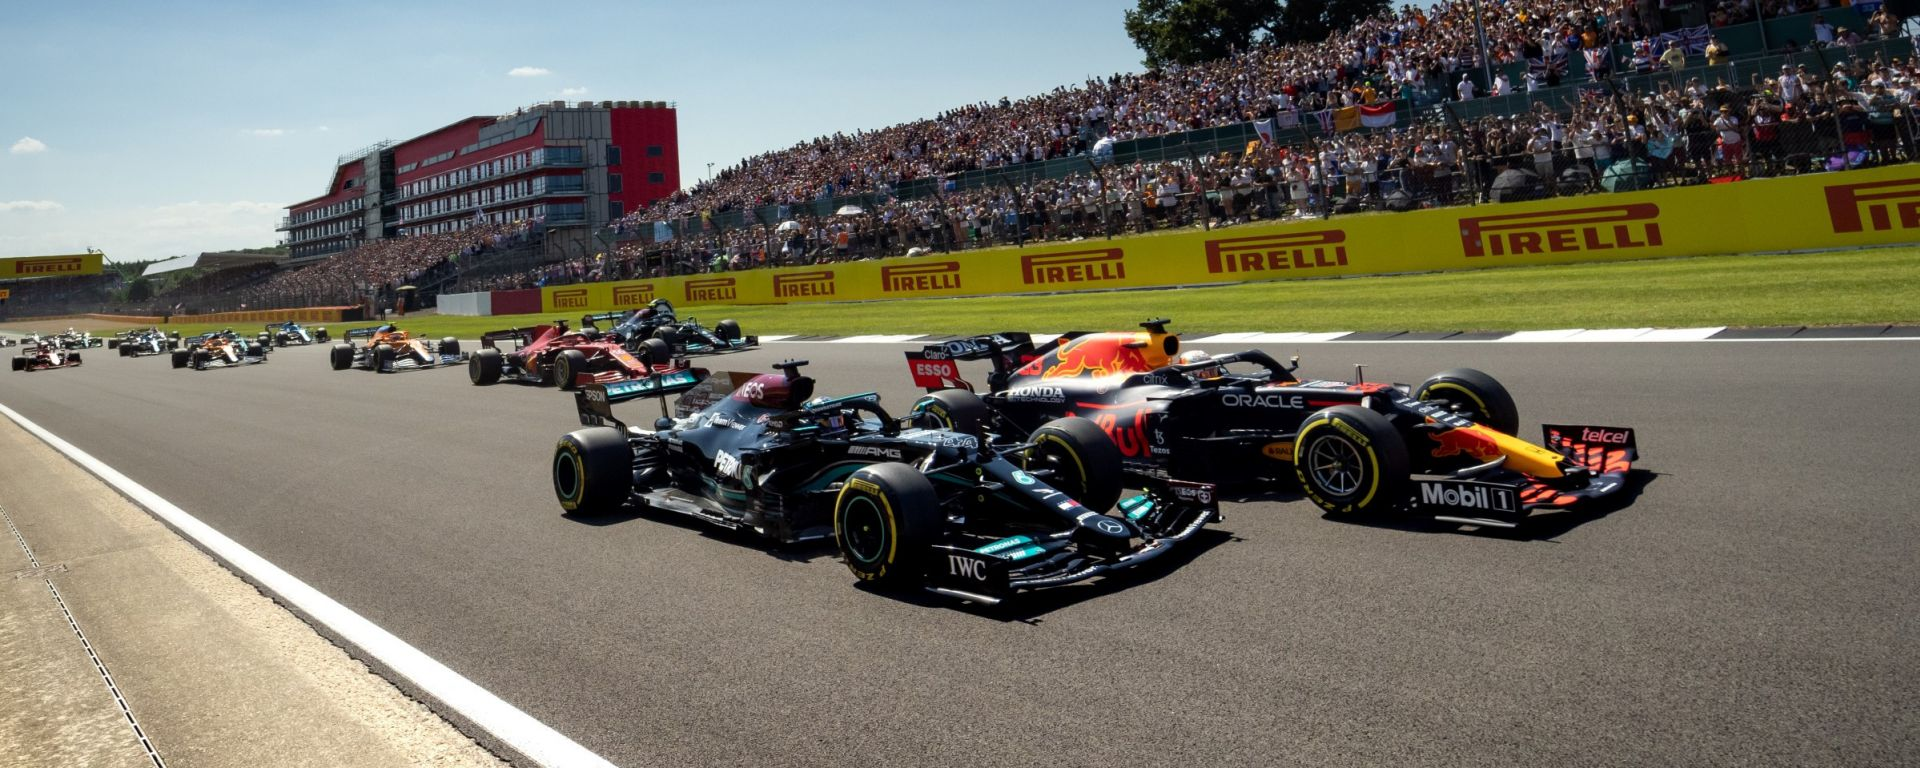 F1, GP Gran Bretagna 2021: Max Verstappen e Lewis Hamilton ruota a ruota